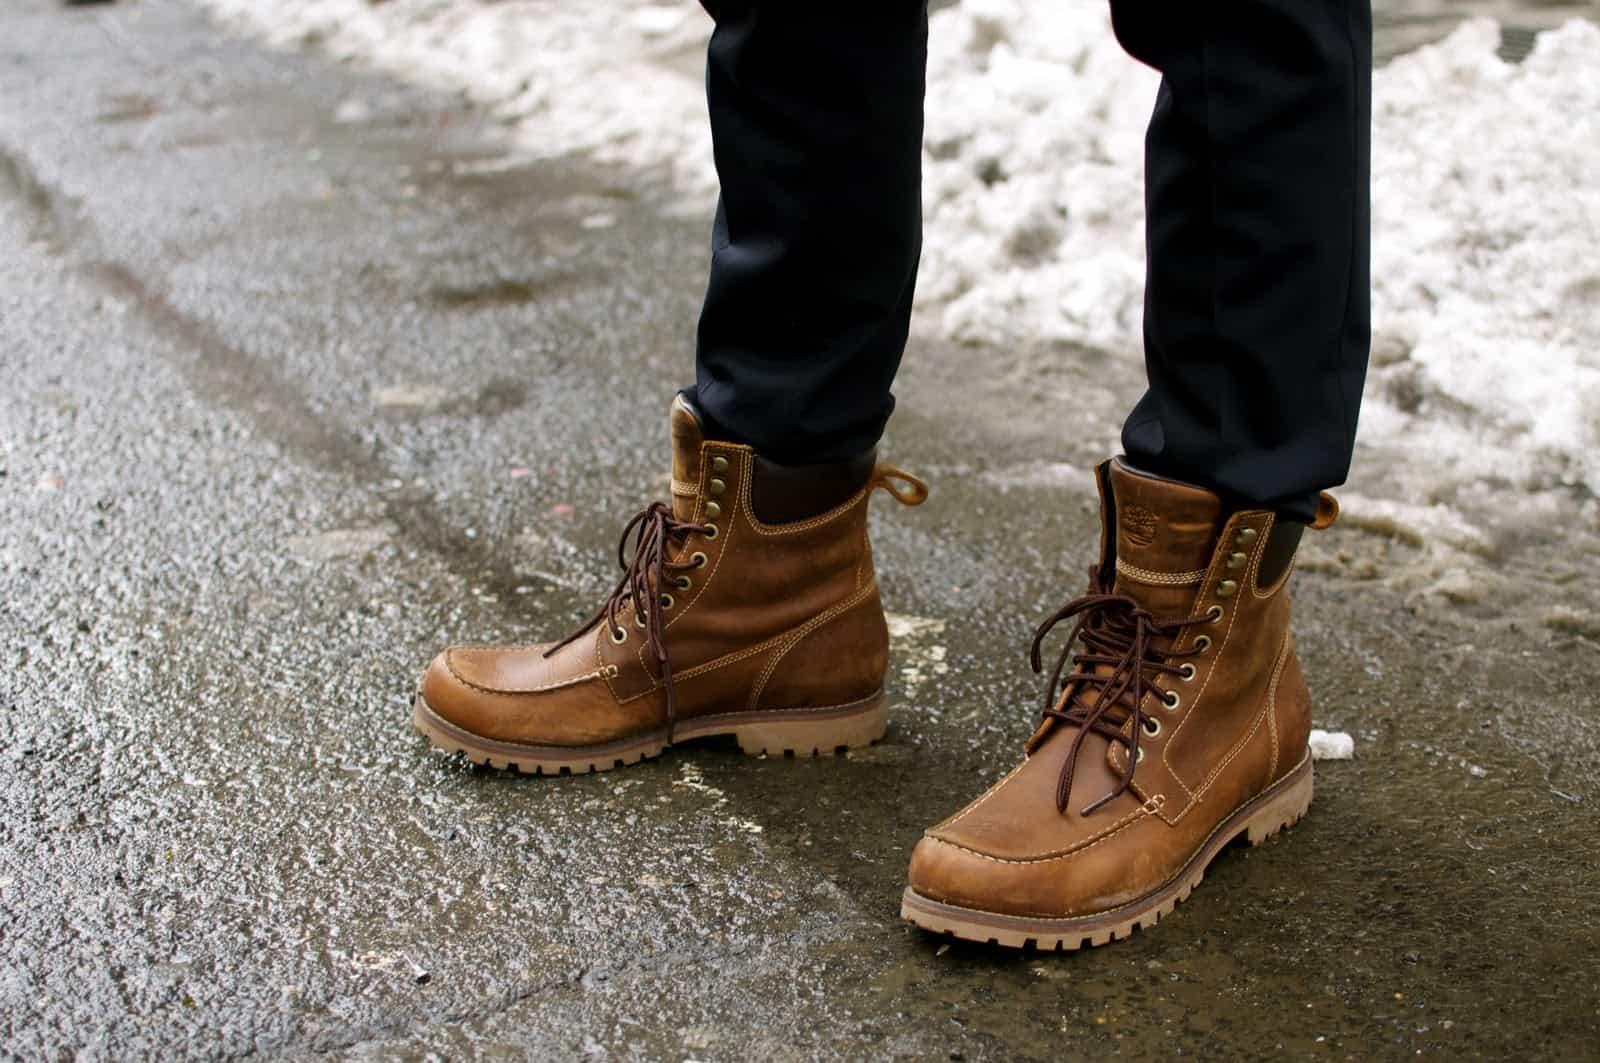 street-style-men-boots-1